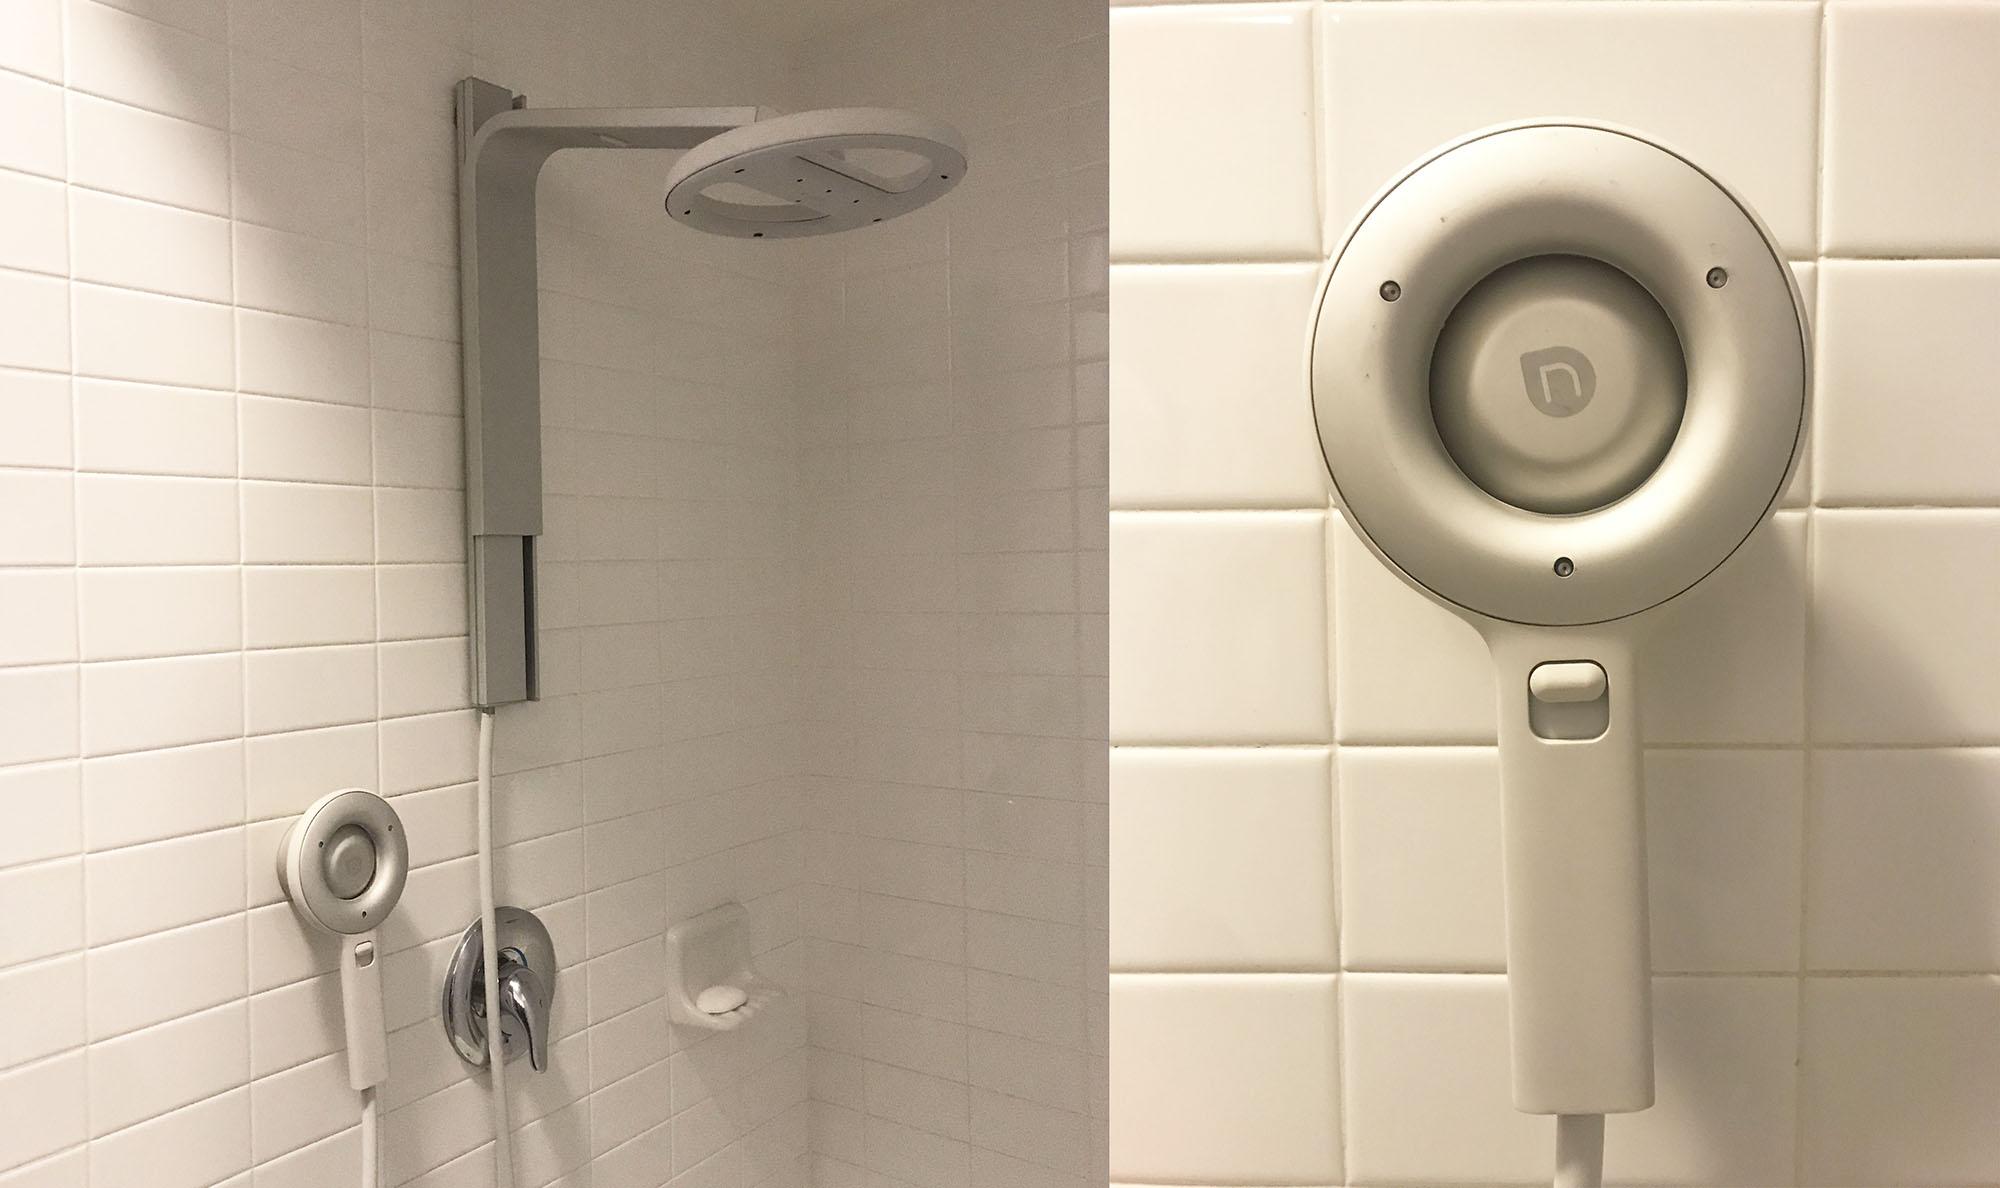 meir overhead mounter round shower en wall with matte black head